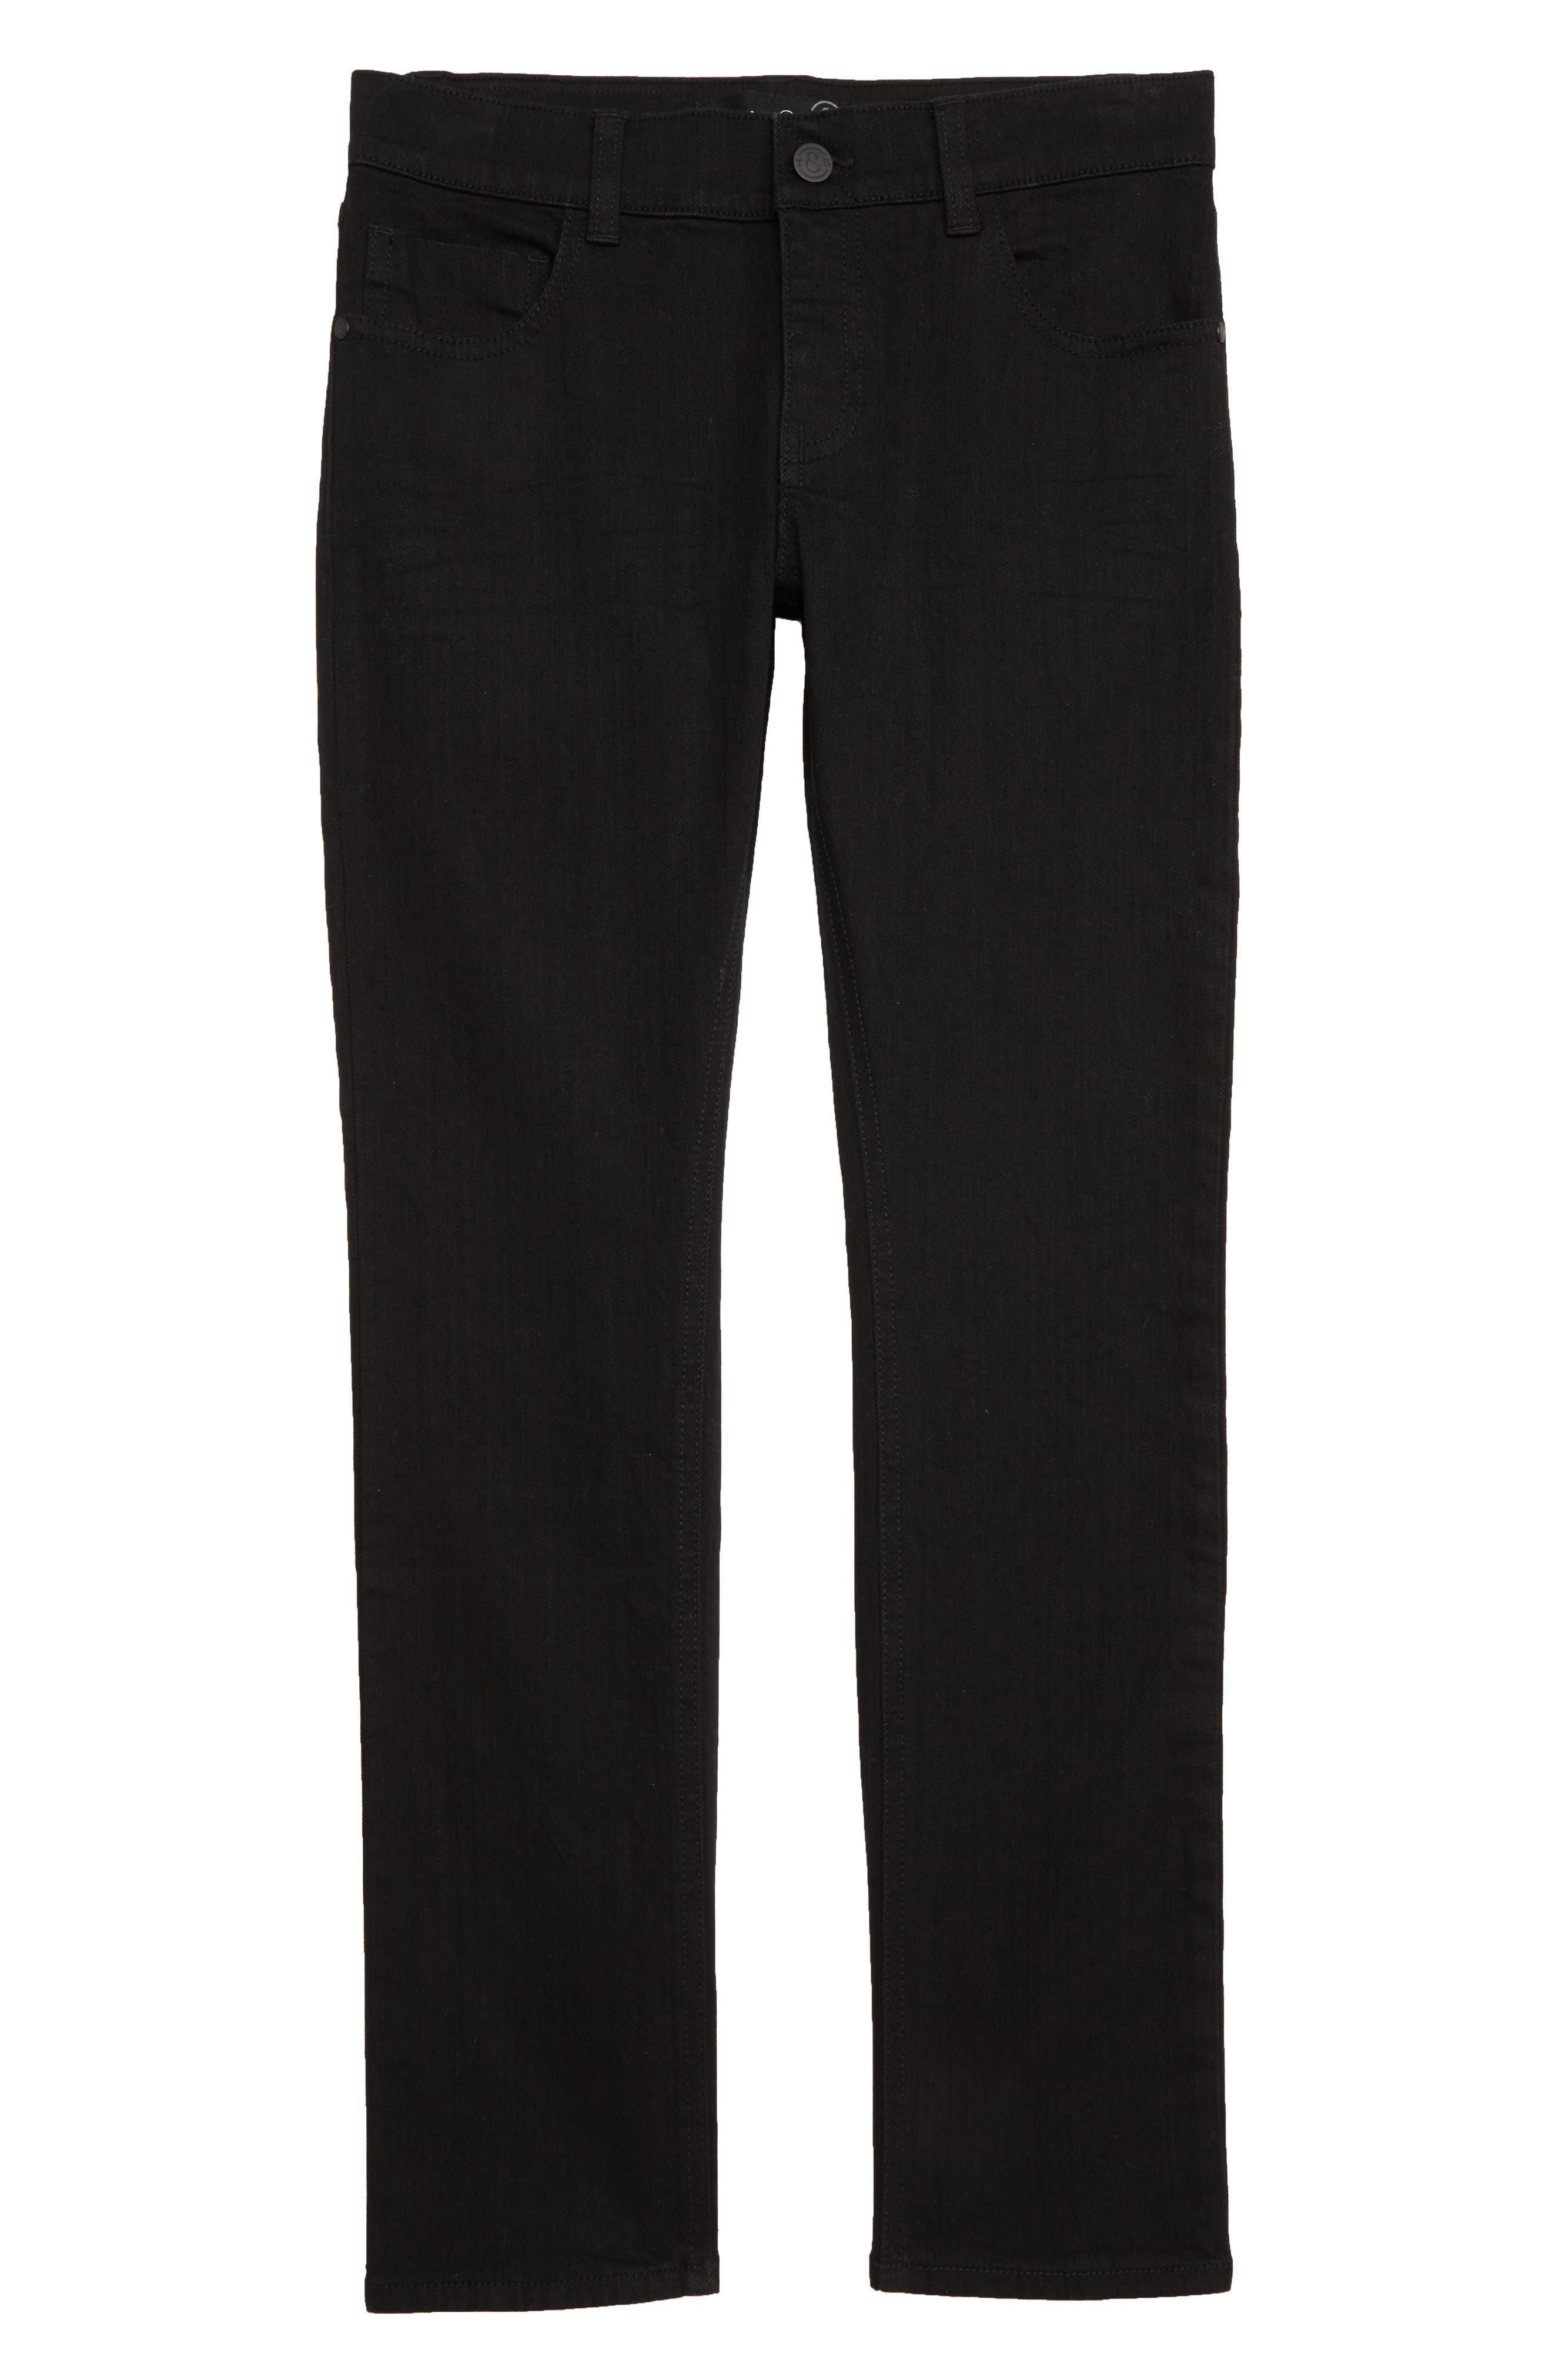 Skinny Jeans,                         Main,                         color, EASY BLACK WASH